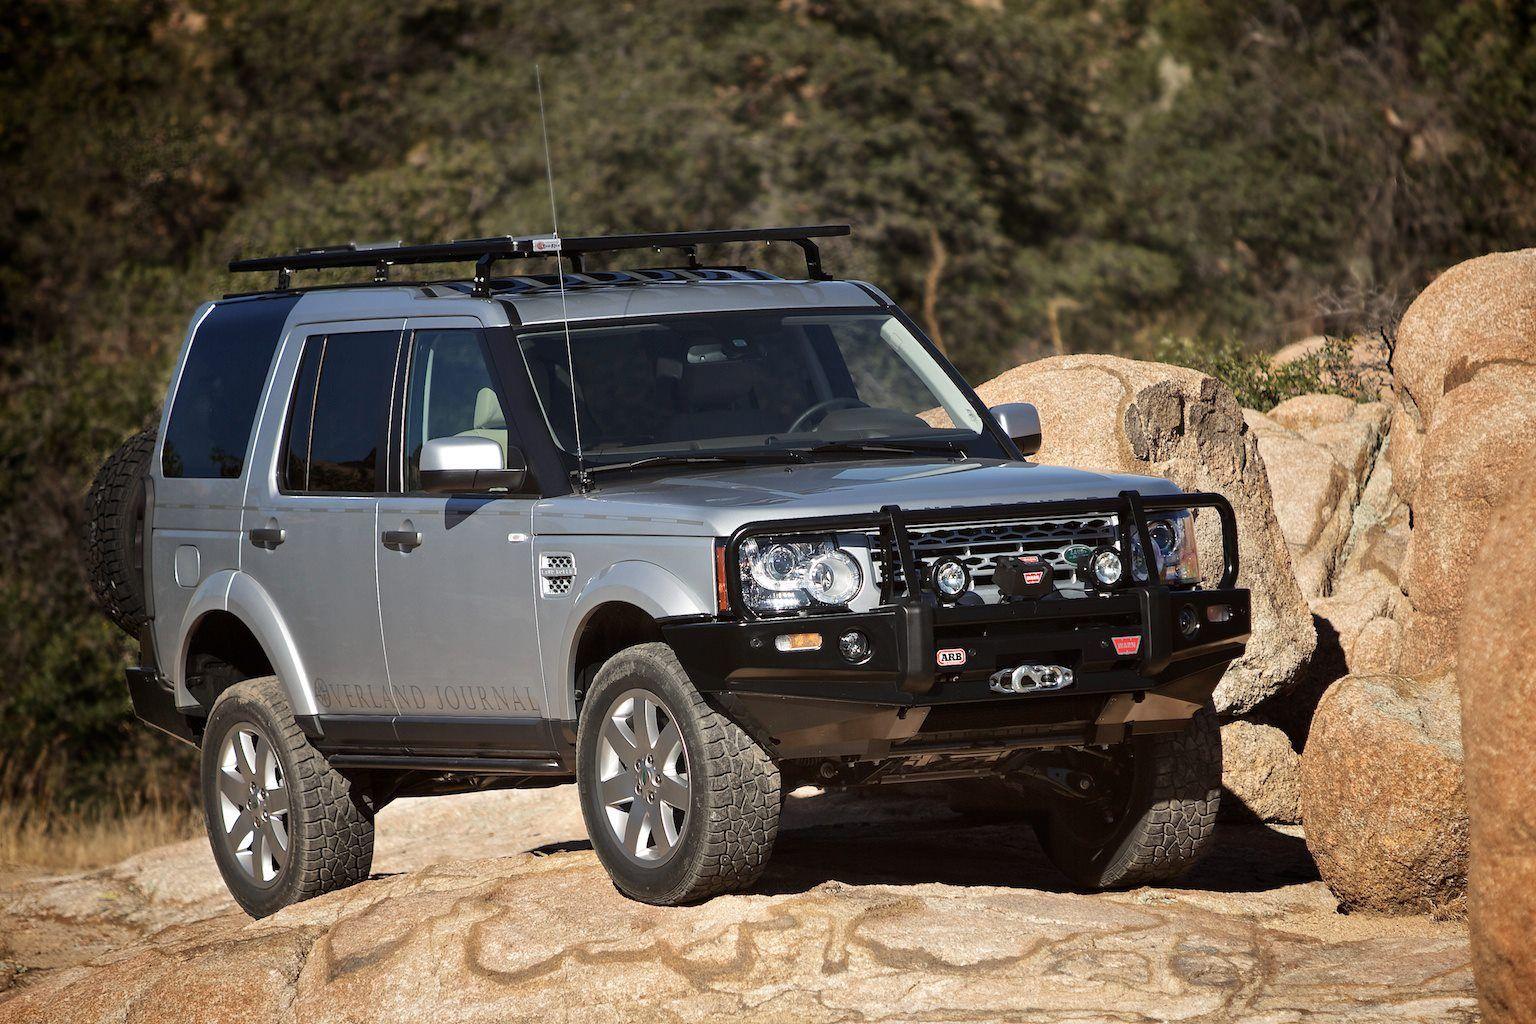 Land Rover Discovery 4 (LR4) Land rover, Land rover